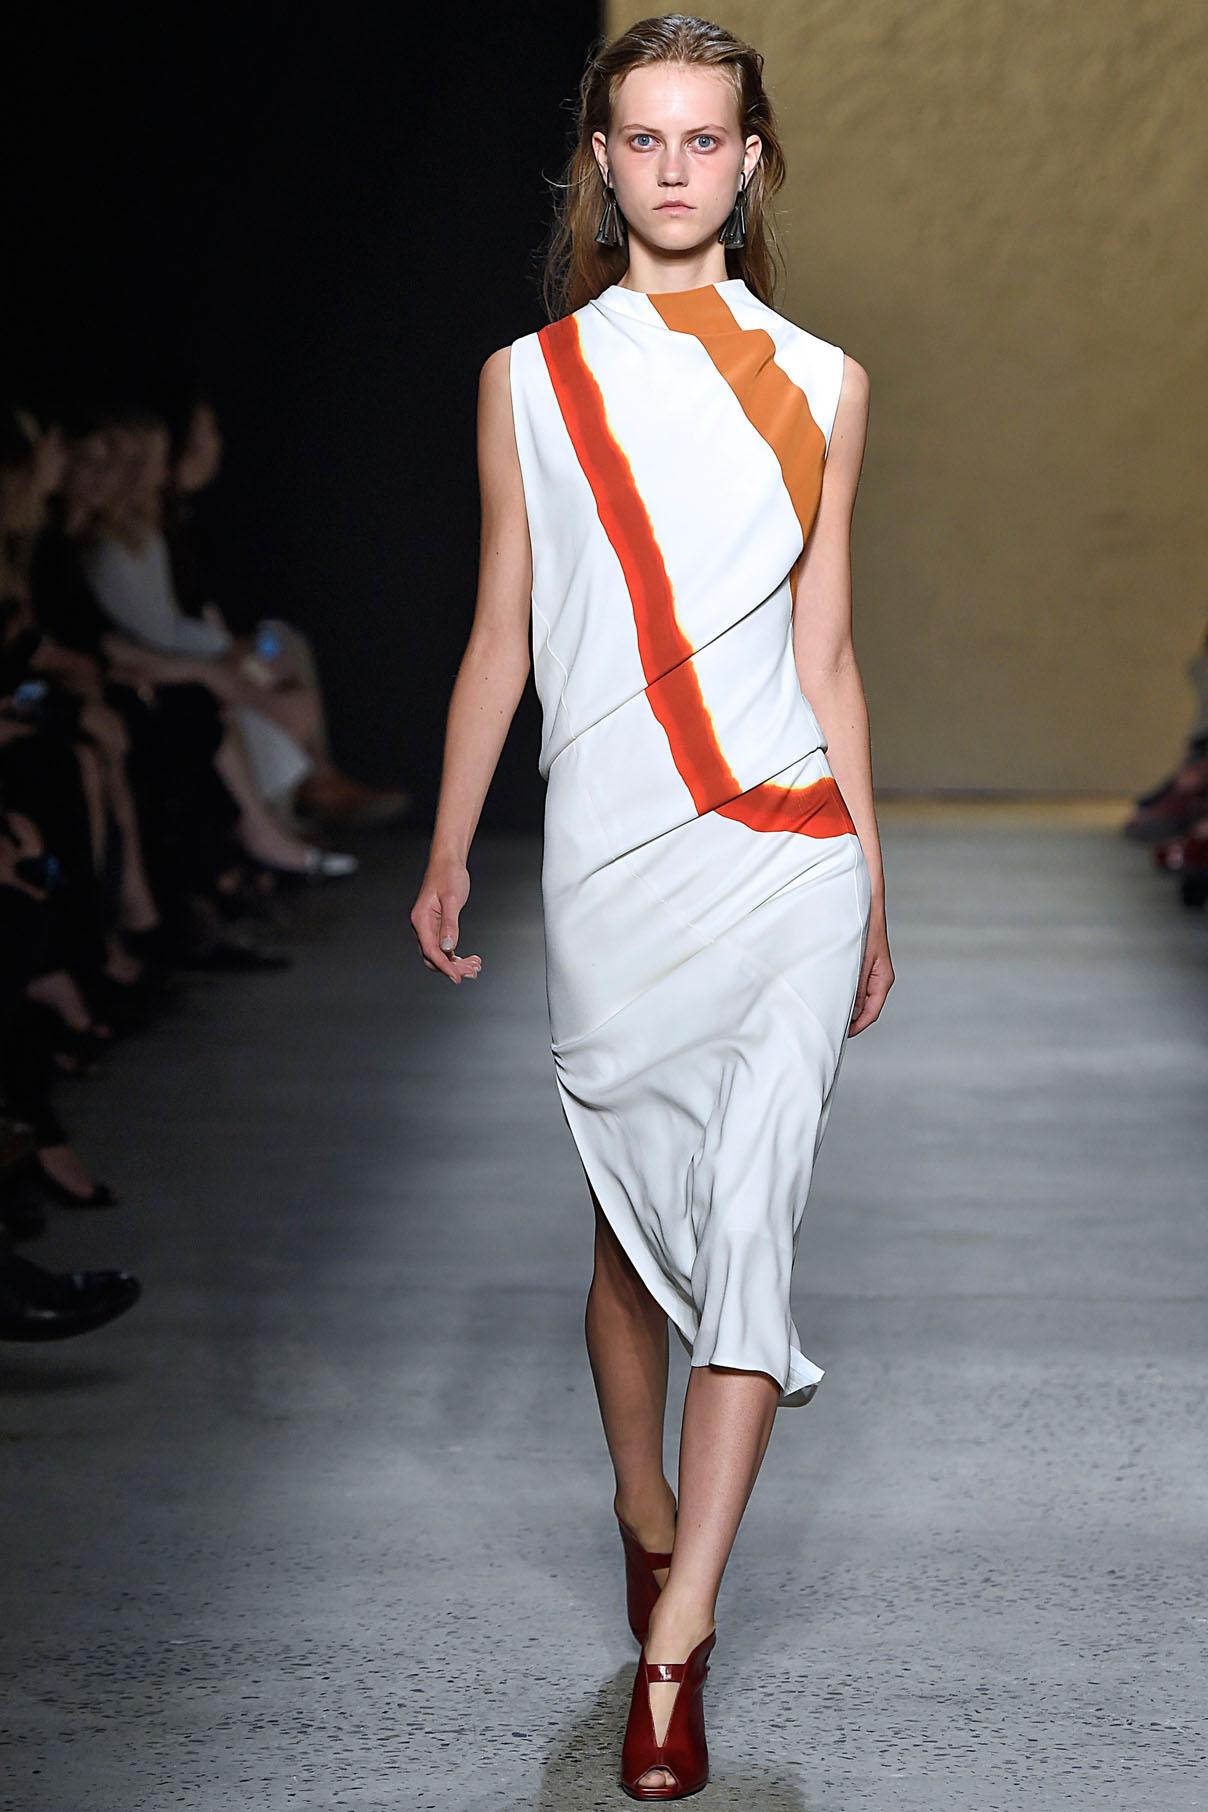 Look 18 Red/flame/amber/white mineral dye print bias dress.